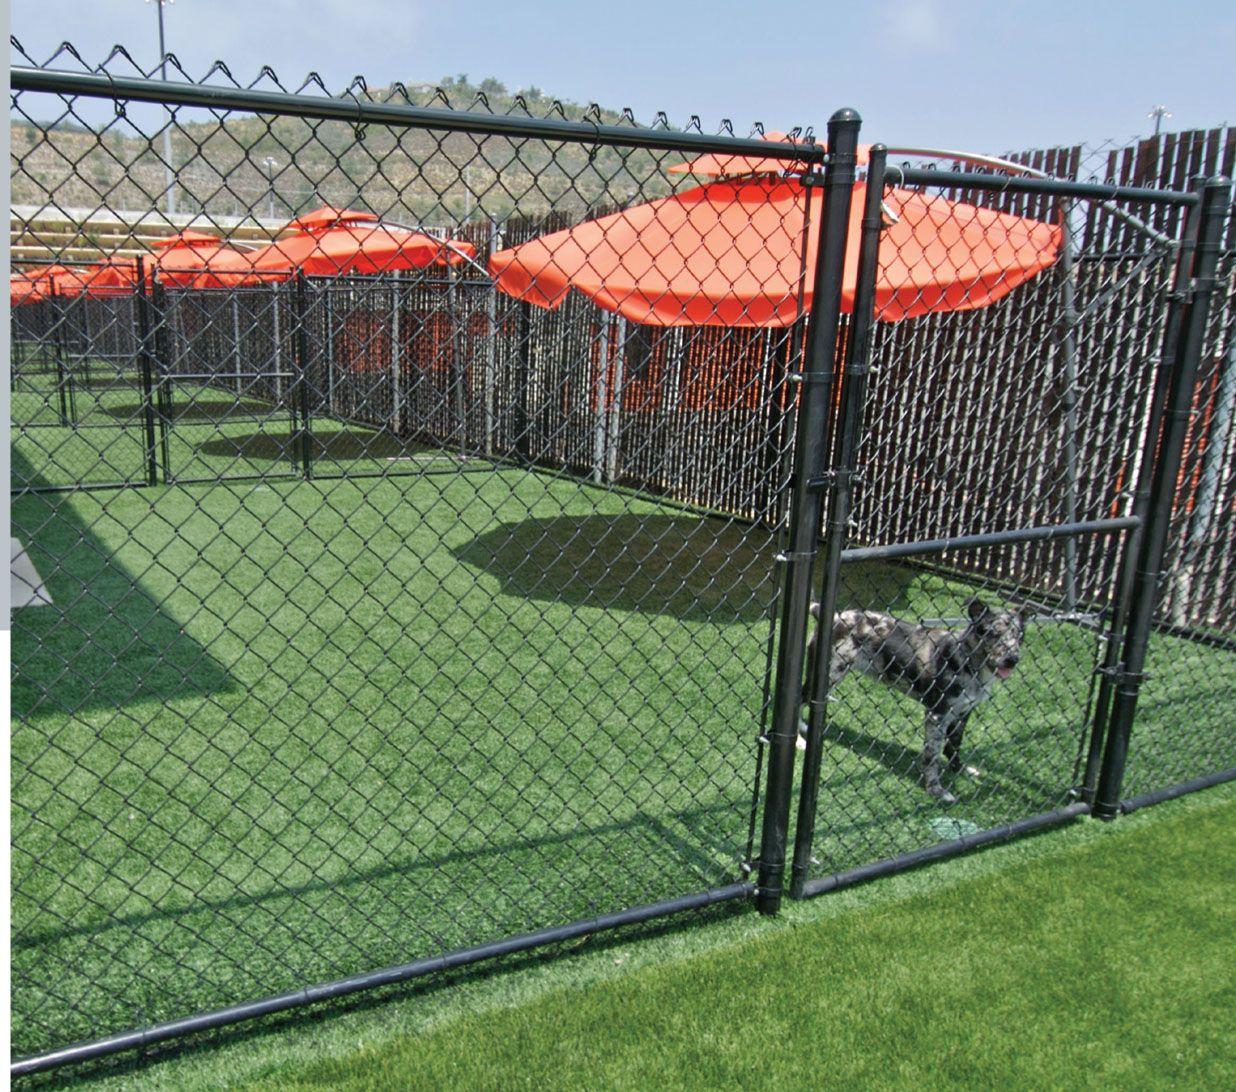 Artificial_Grass_for_Dog_Boarding_Facilities_&_Dog